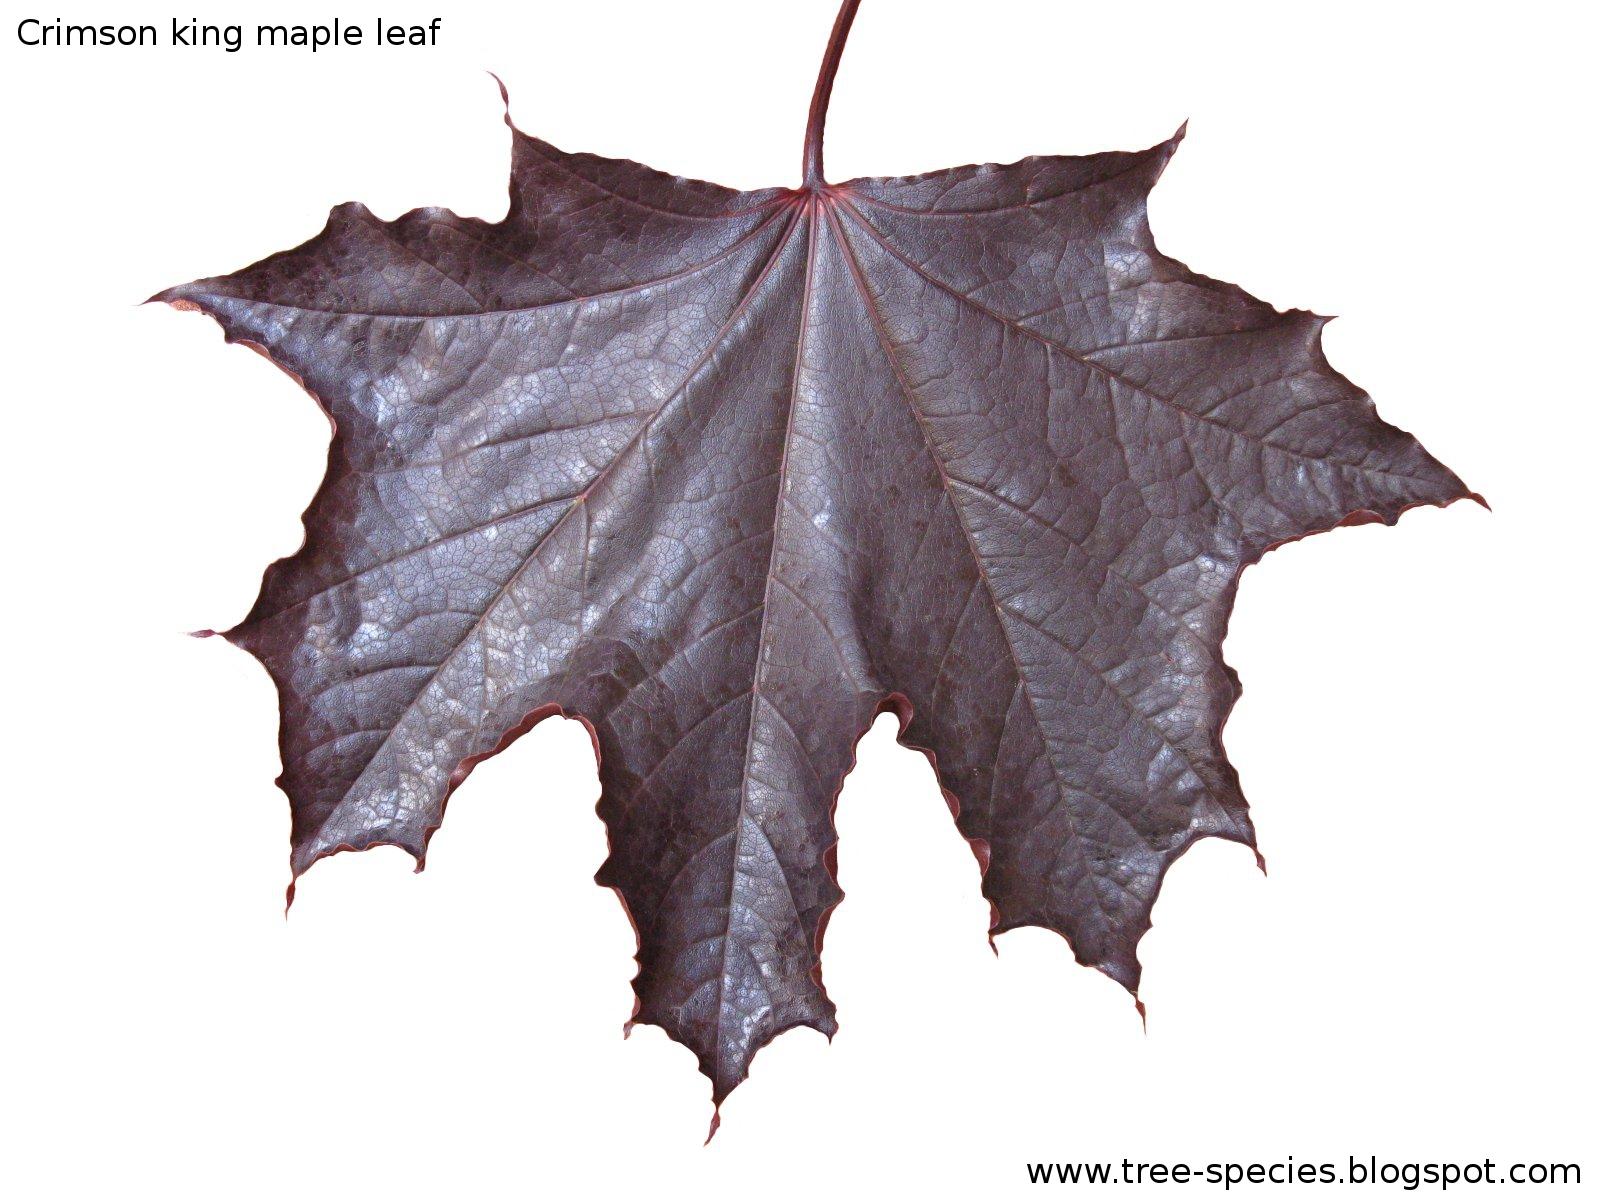 The World´s Tree Species: Crimson king maple leaf